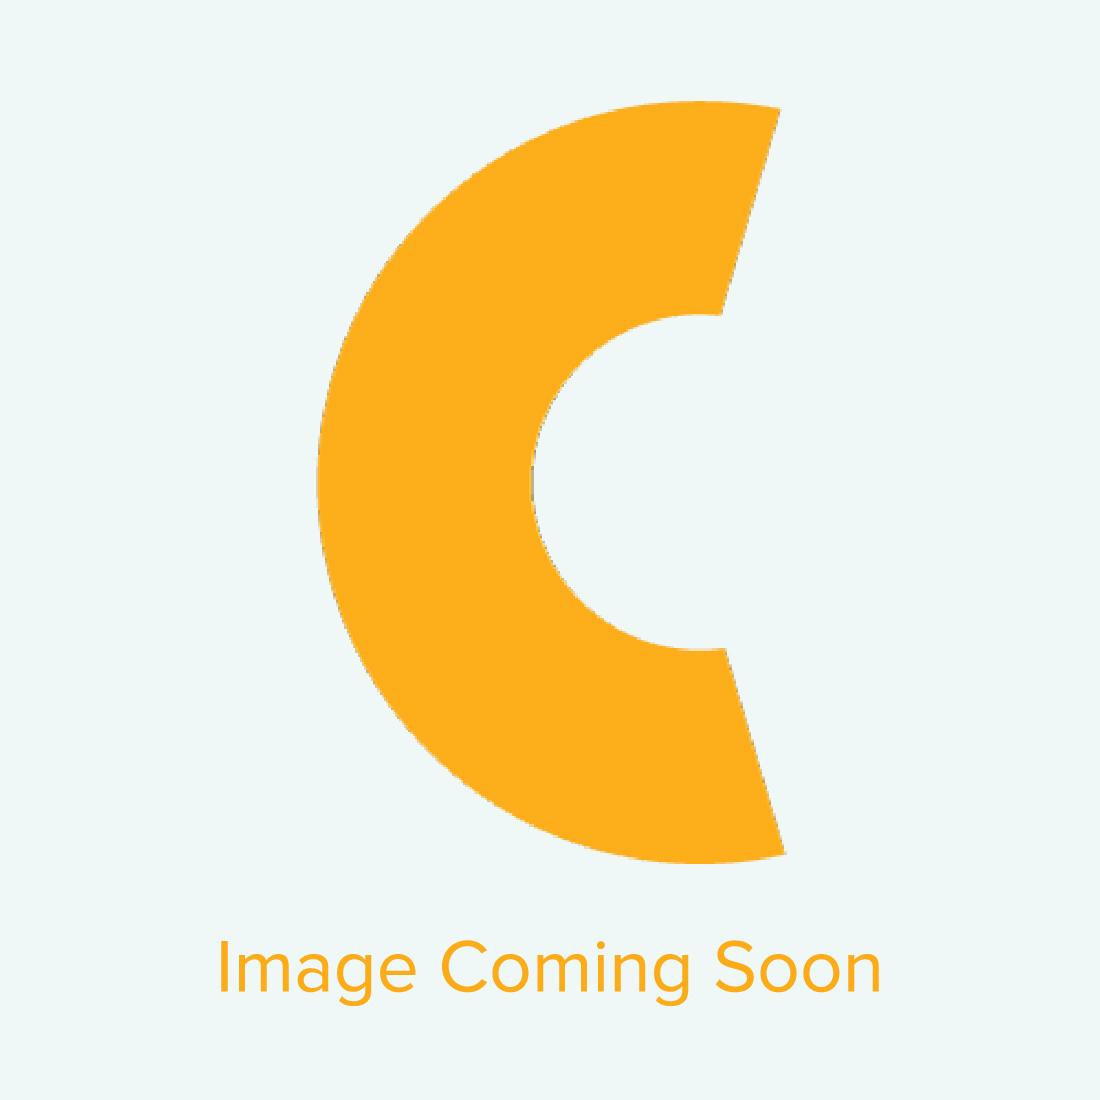 "ImageClip Heat Transfer Paper - 11.7"" x 16.5"" - 500/pack"